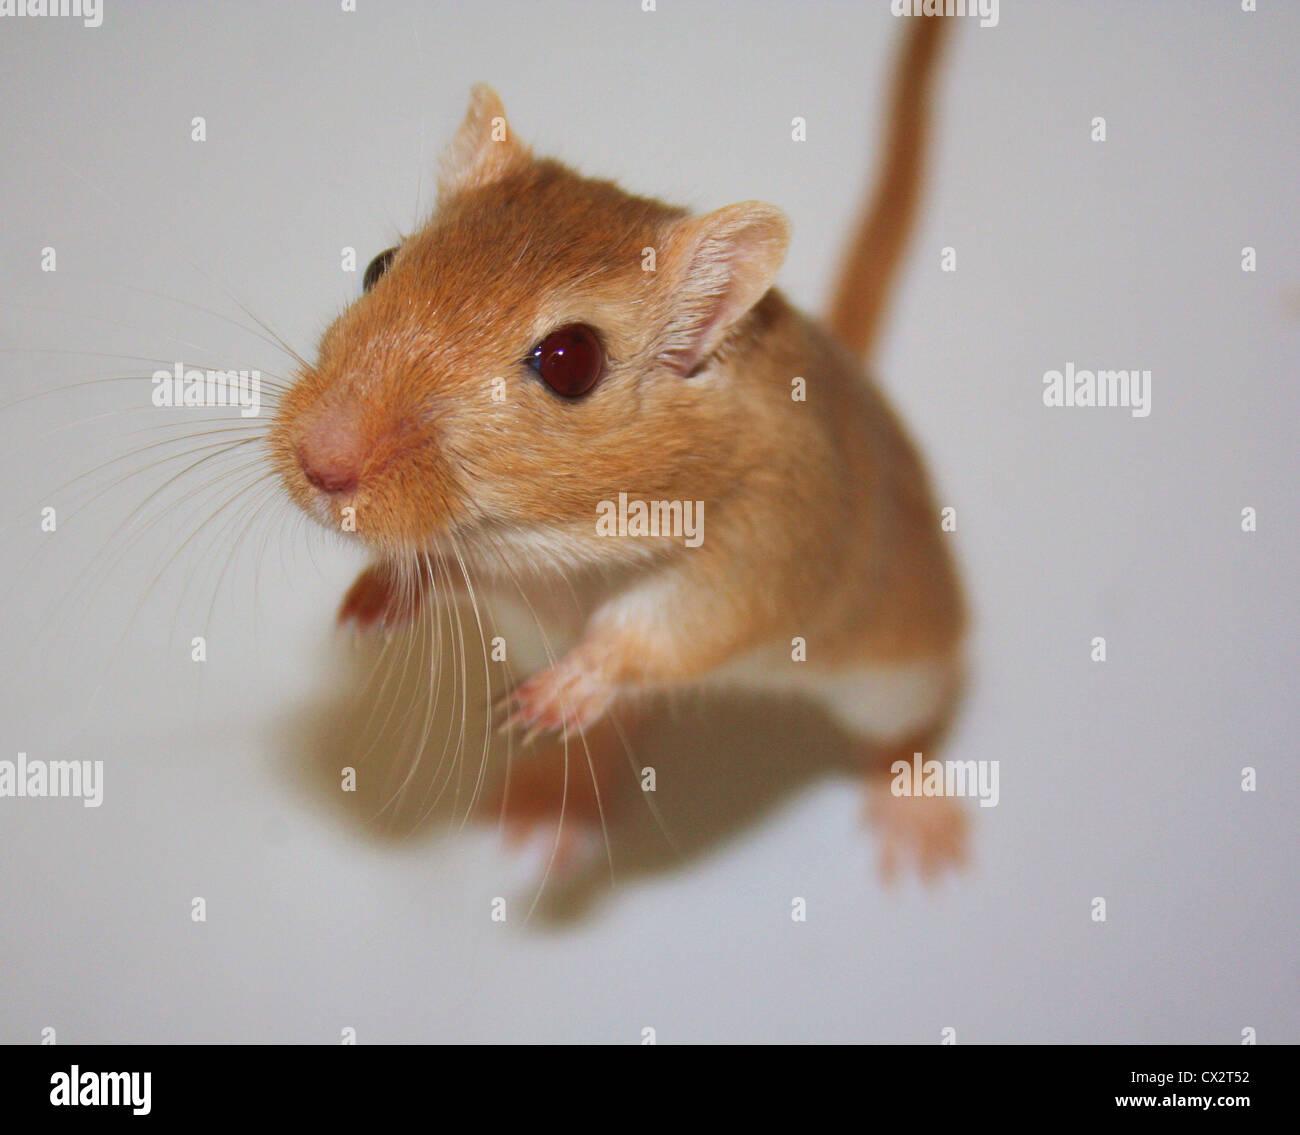 Haustier Rennmaus Stockbild